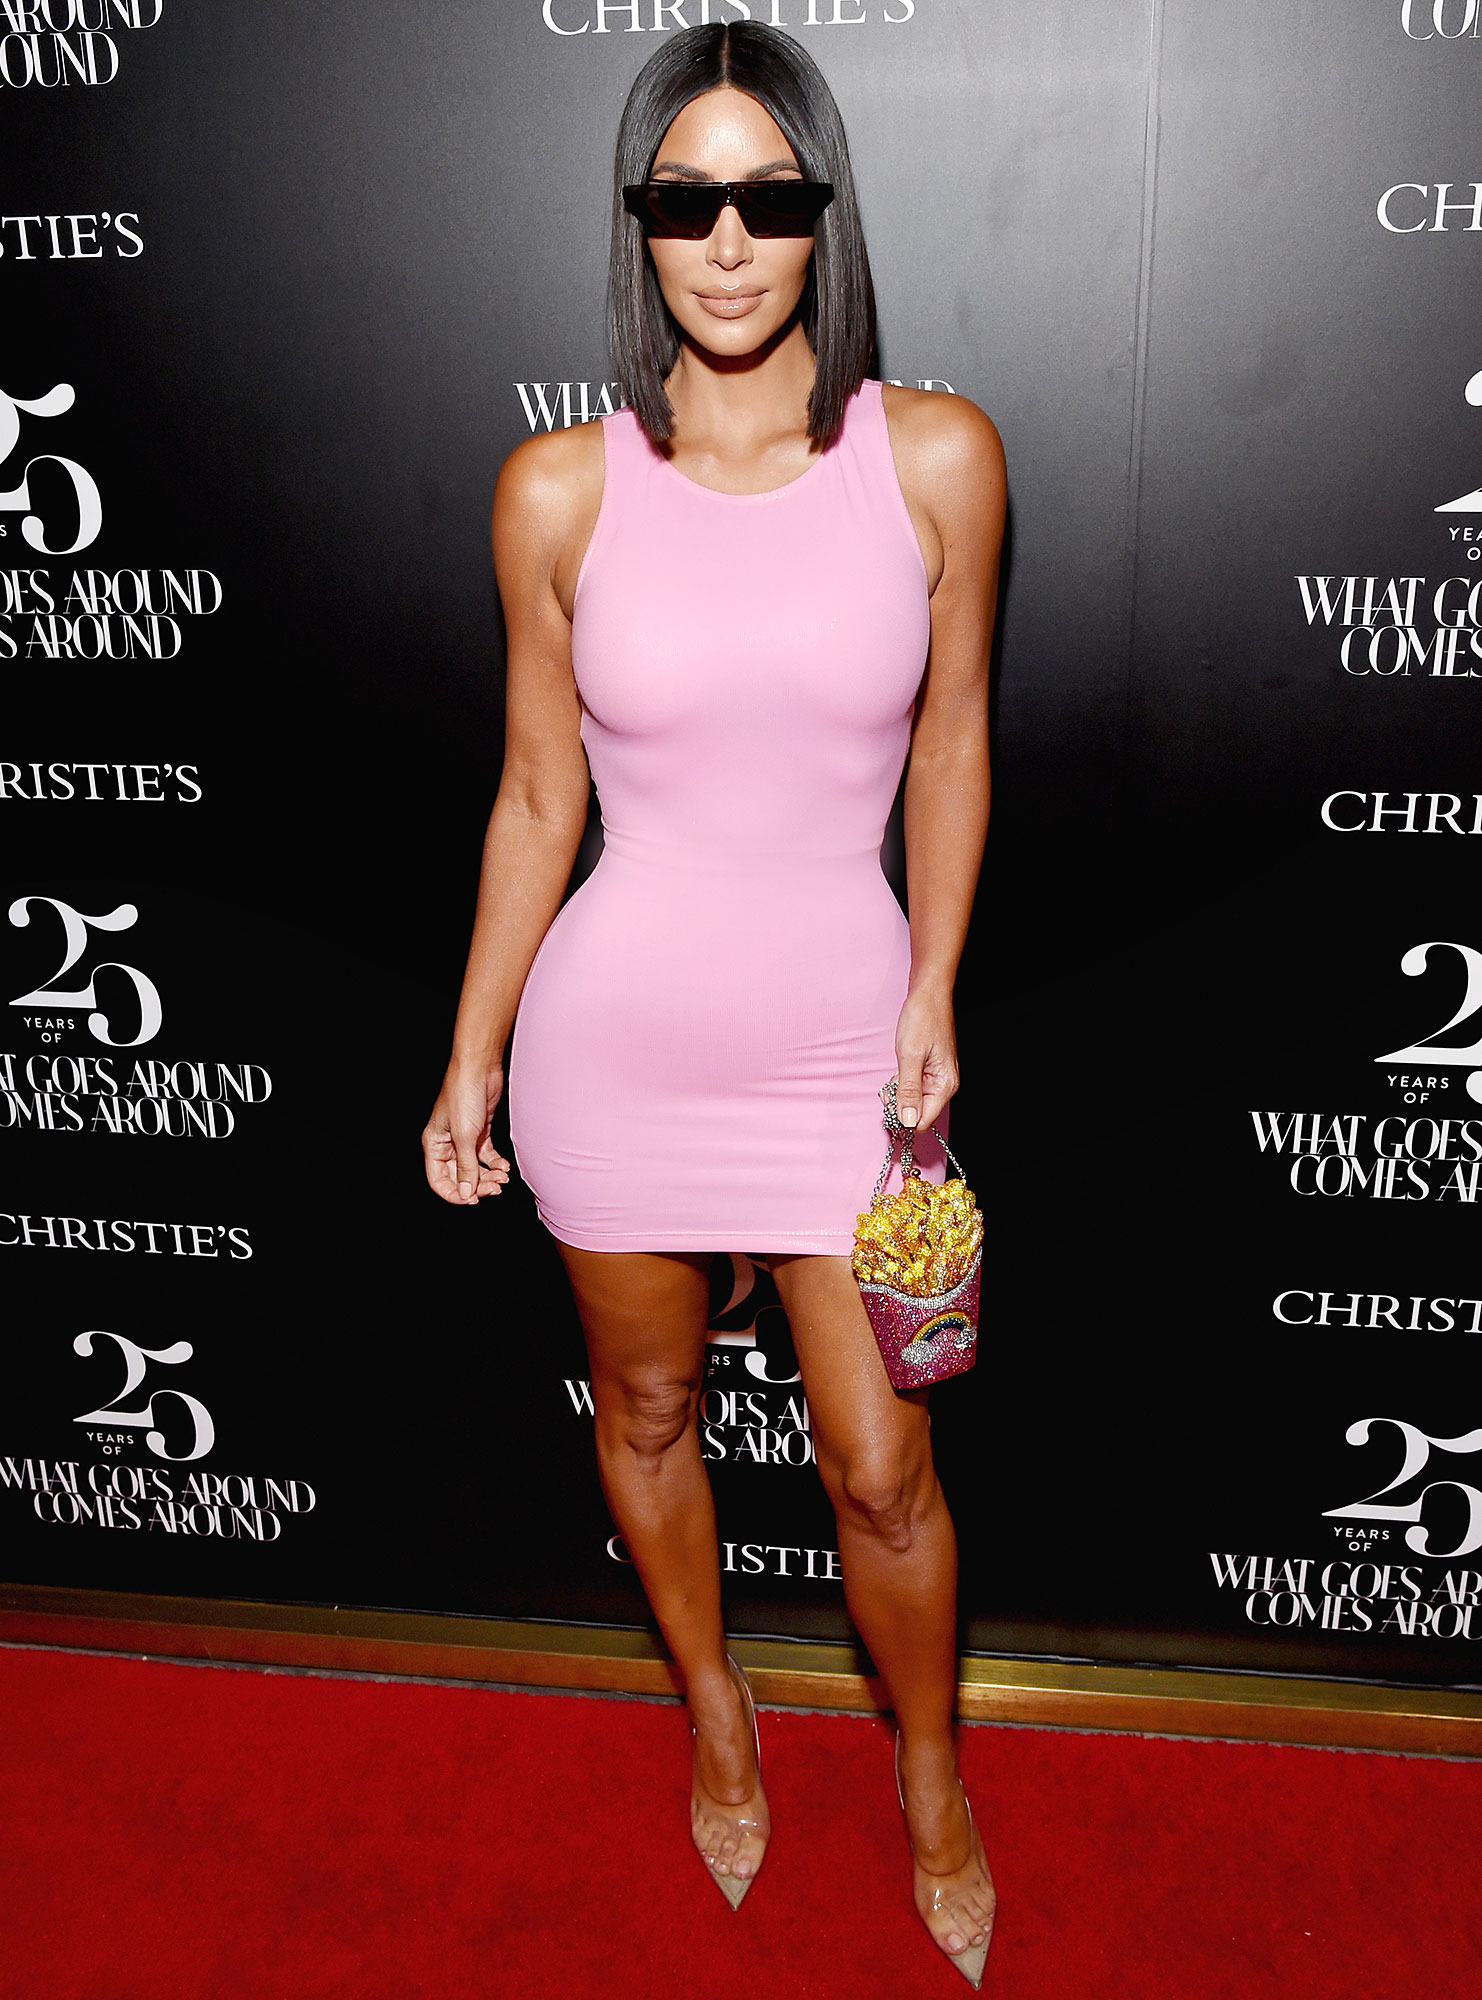 Gunnar Peterson Defends Kim Kardashian Weight